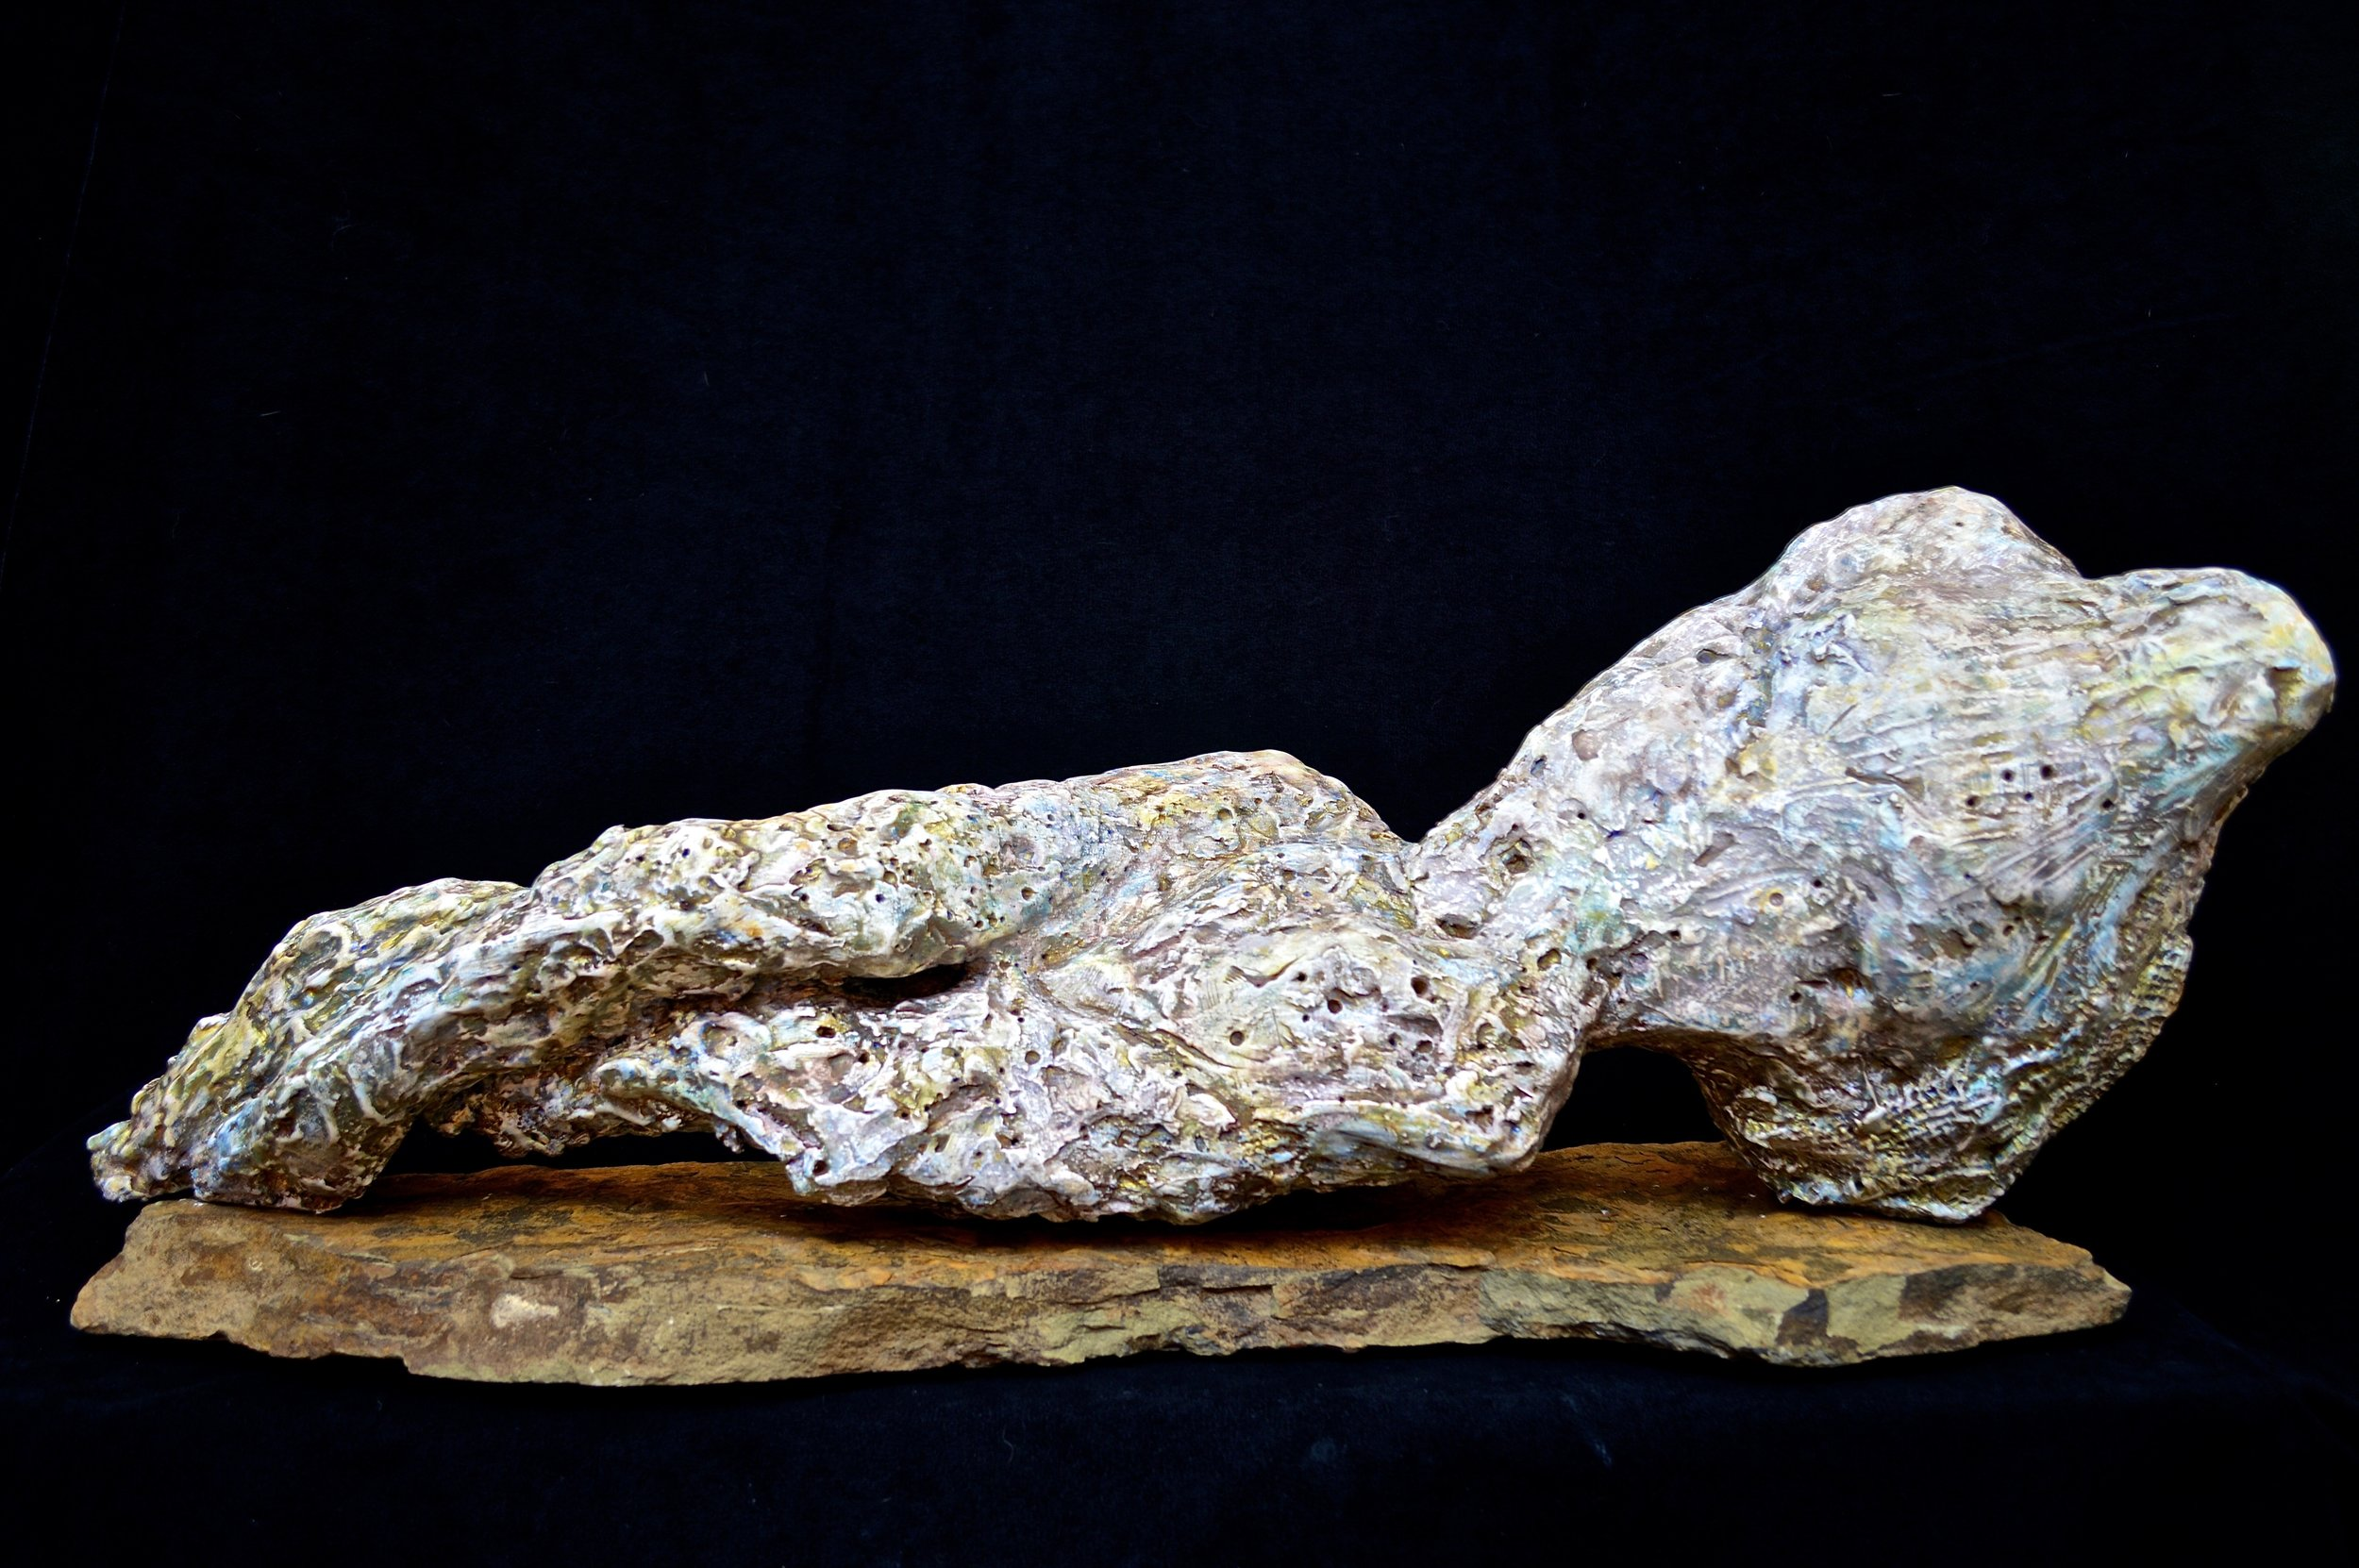 plaster, stone, oxides